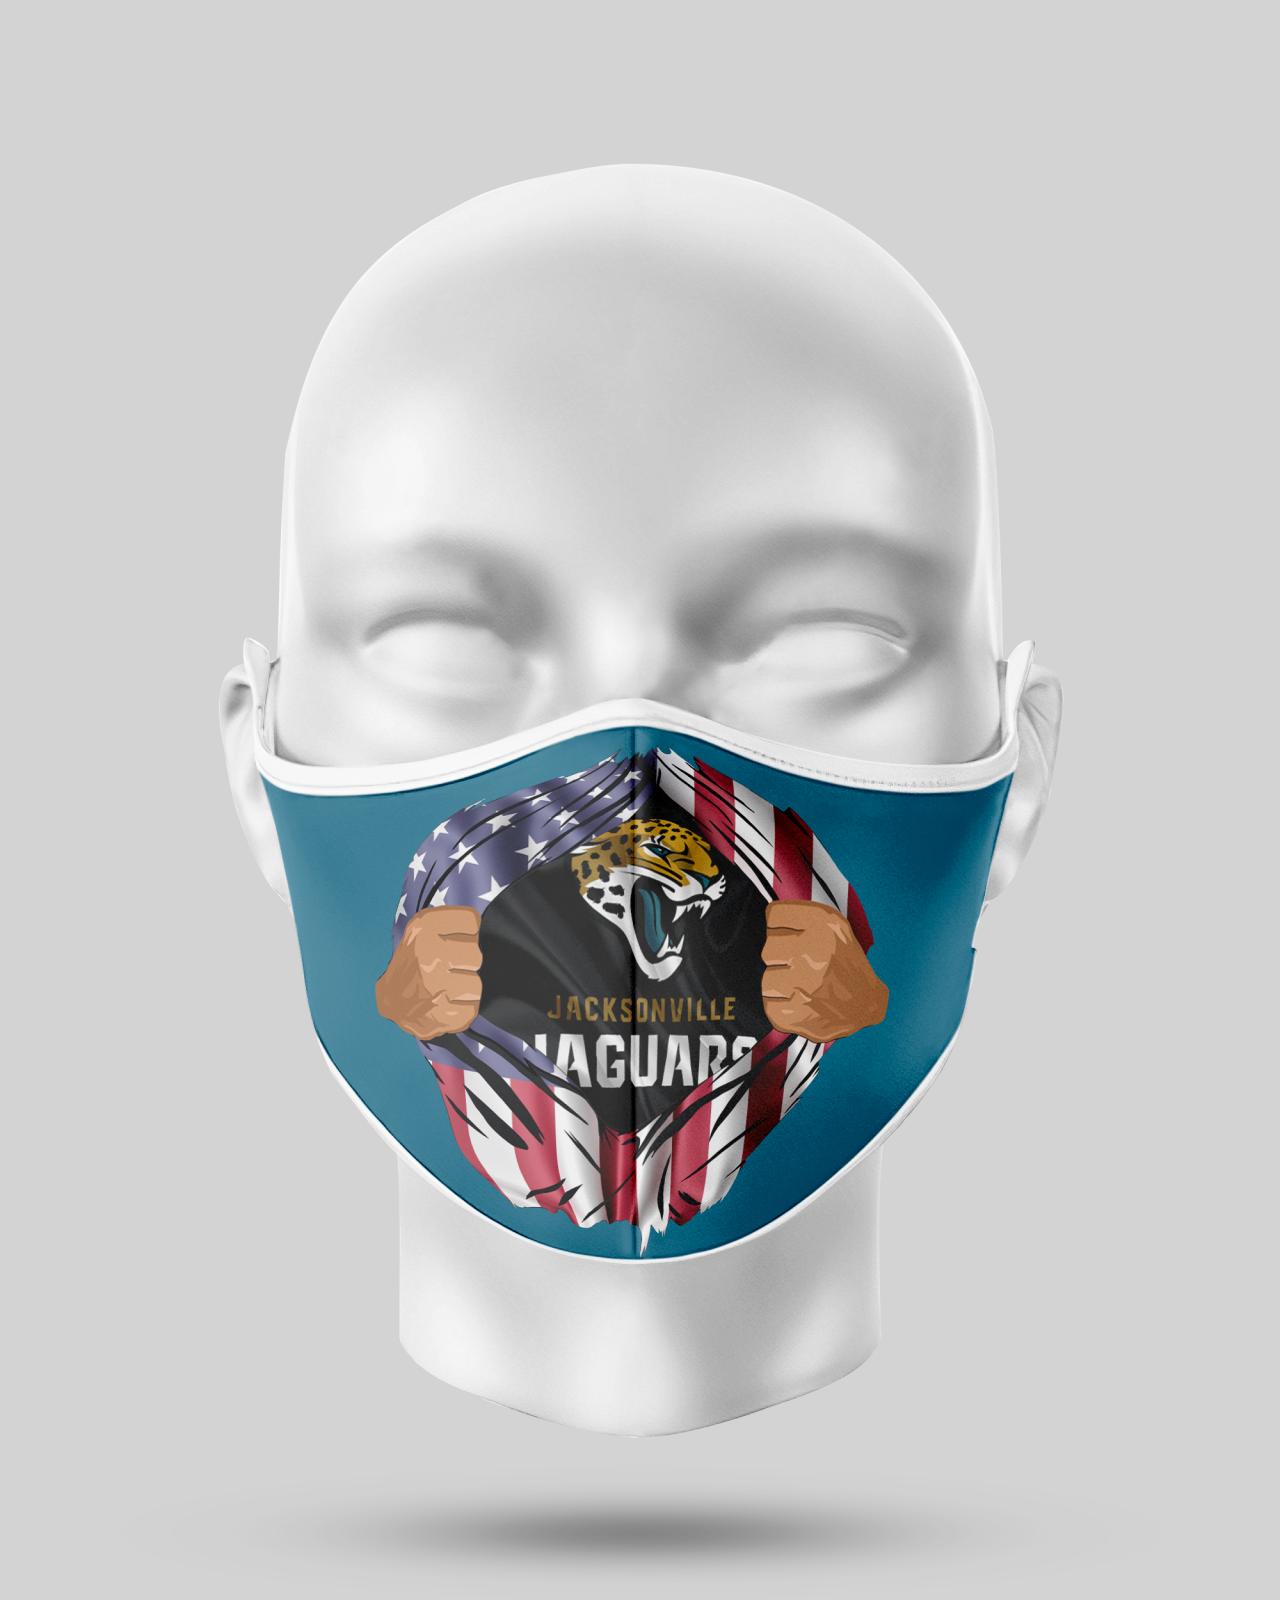 Jaguars Face Mask